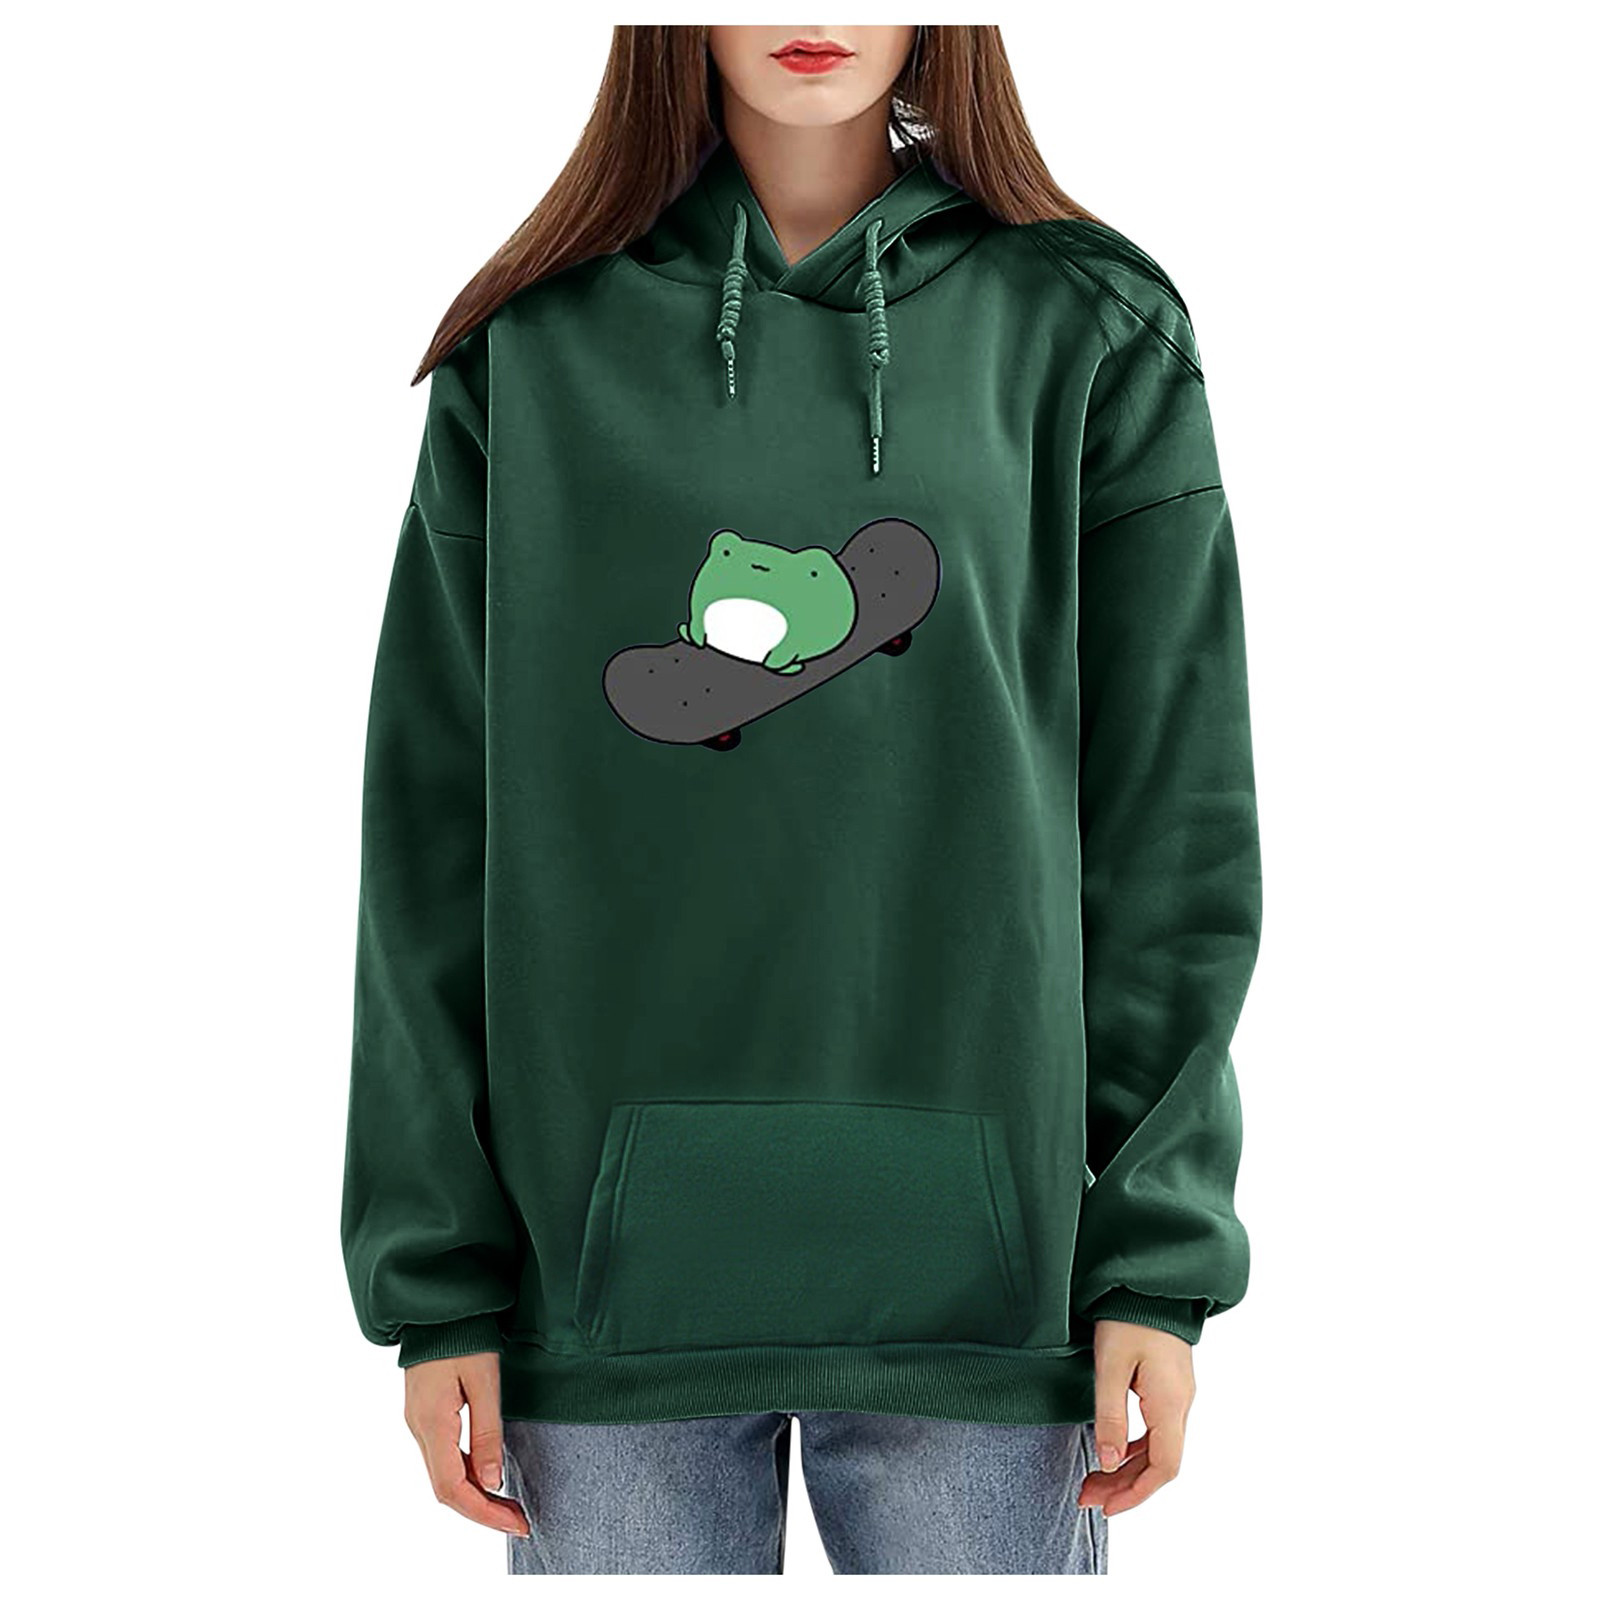 harajuku aesthetic bear anime hoodie women korean kawaii crewneck long sleeve oversized fall winter clothes kpop streetwear tops 13